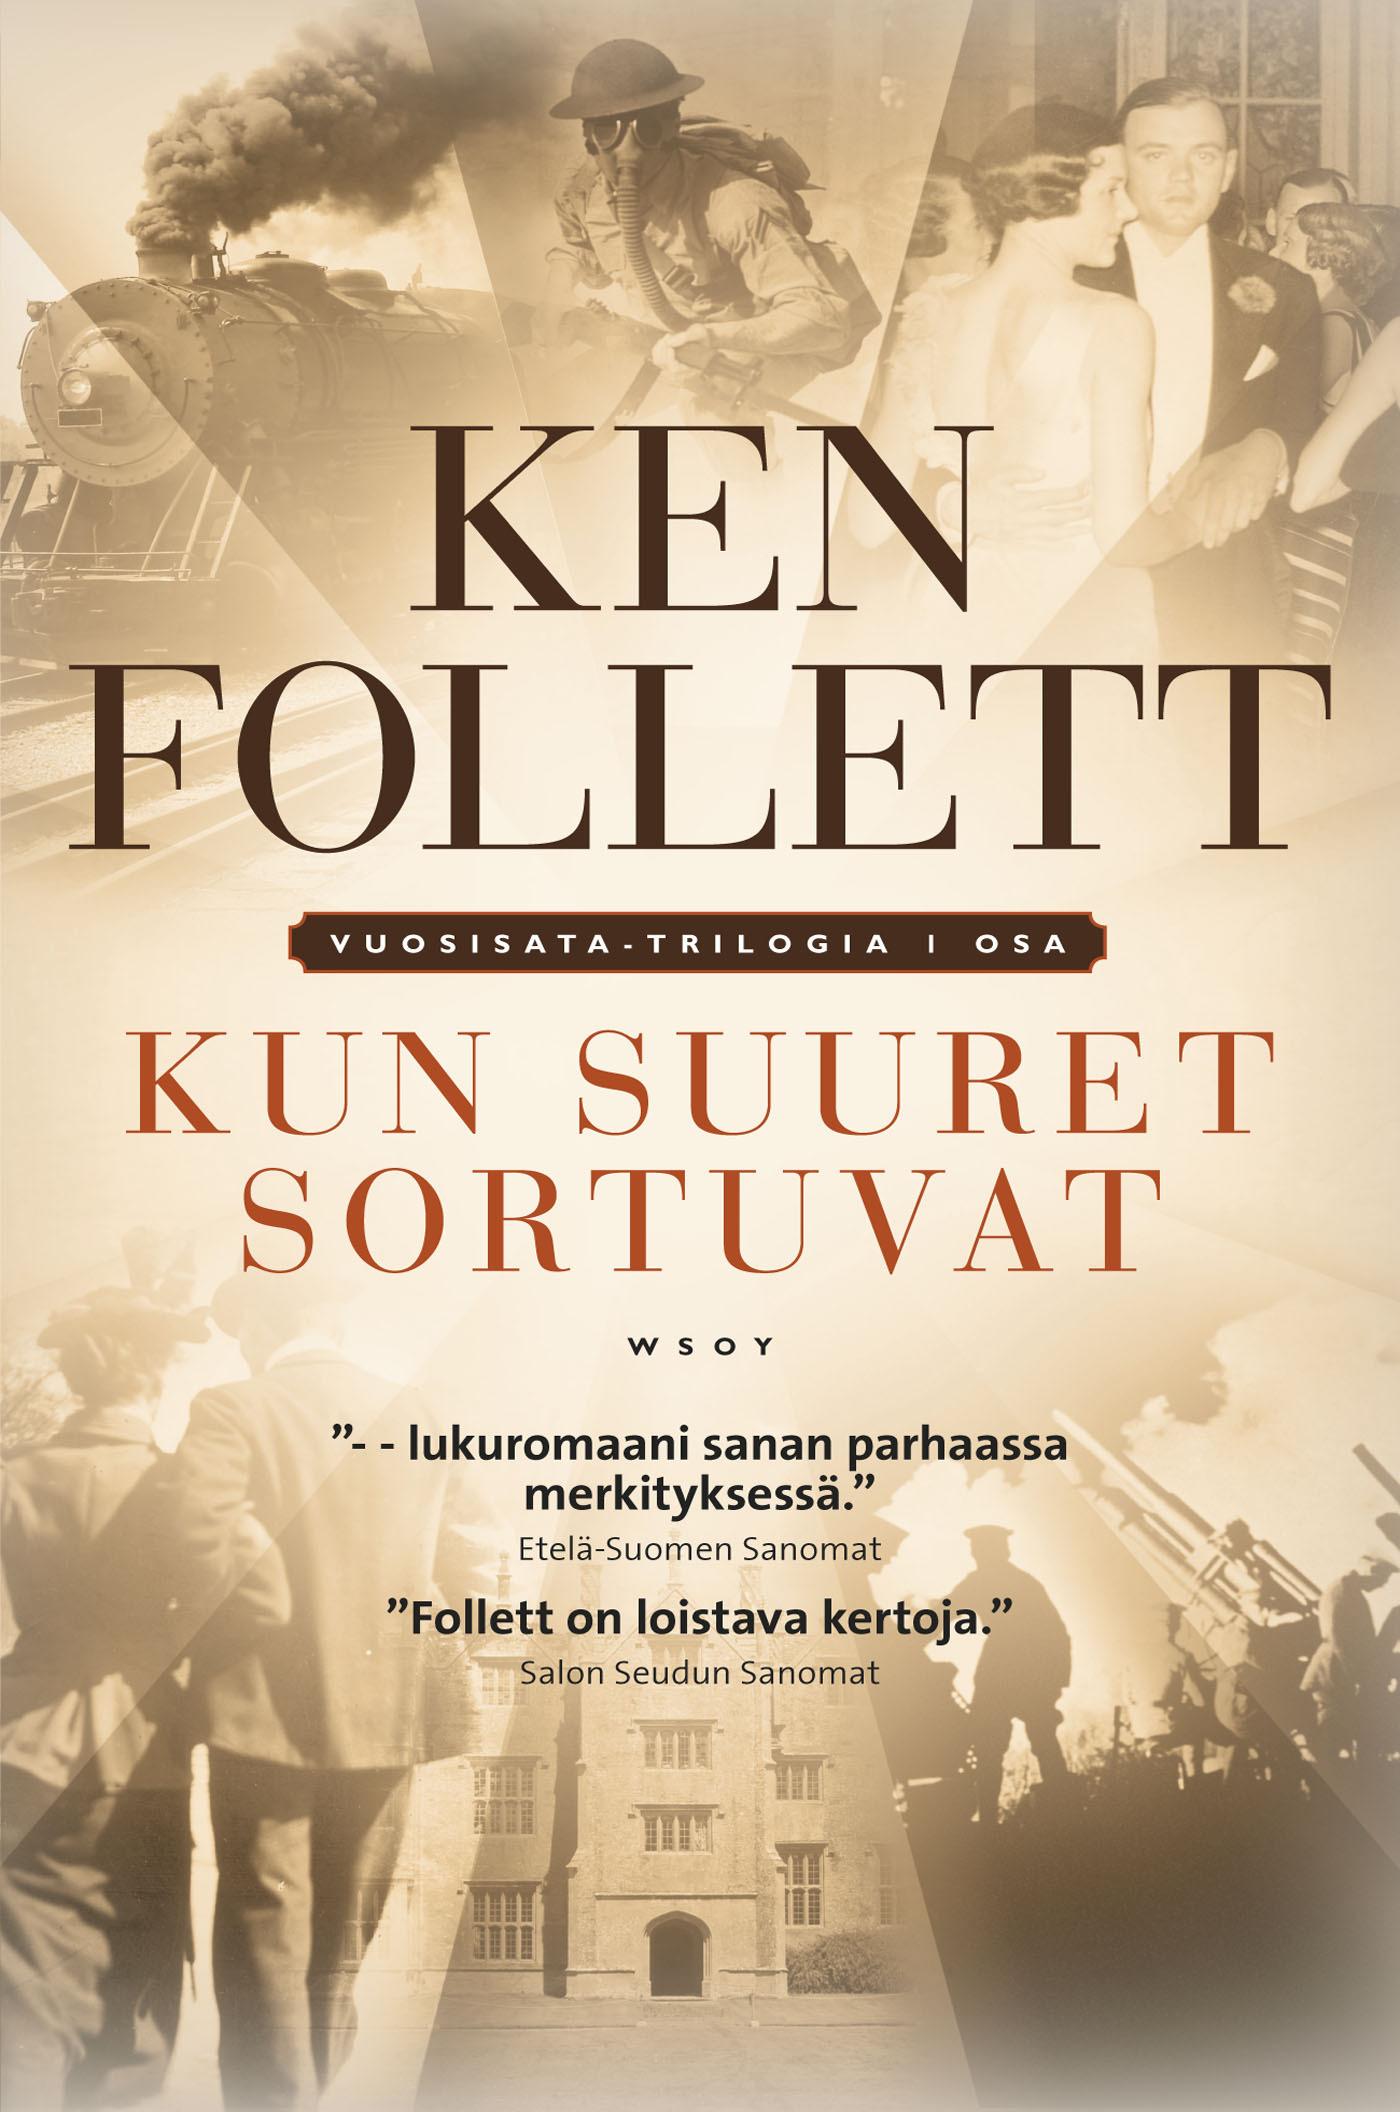 Follett, Ken - Kun suuret sortuvat: Vuosisata-trilogia I osa, e-bok